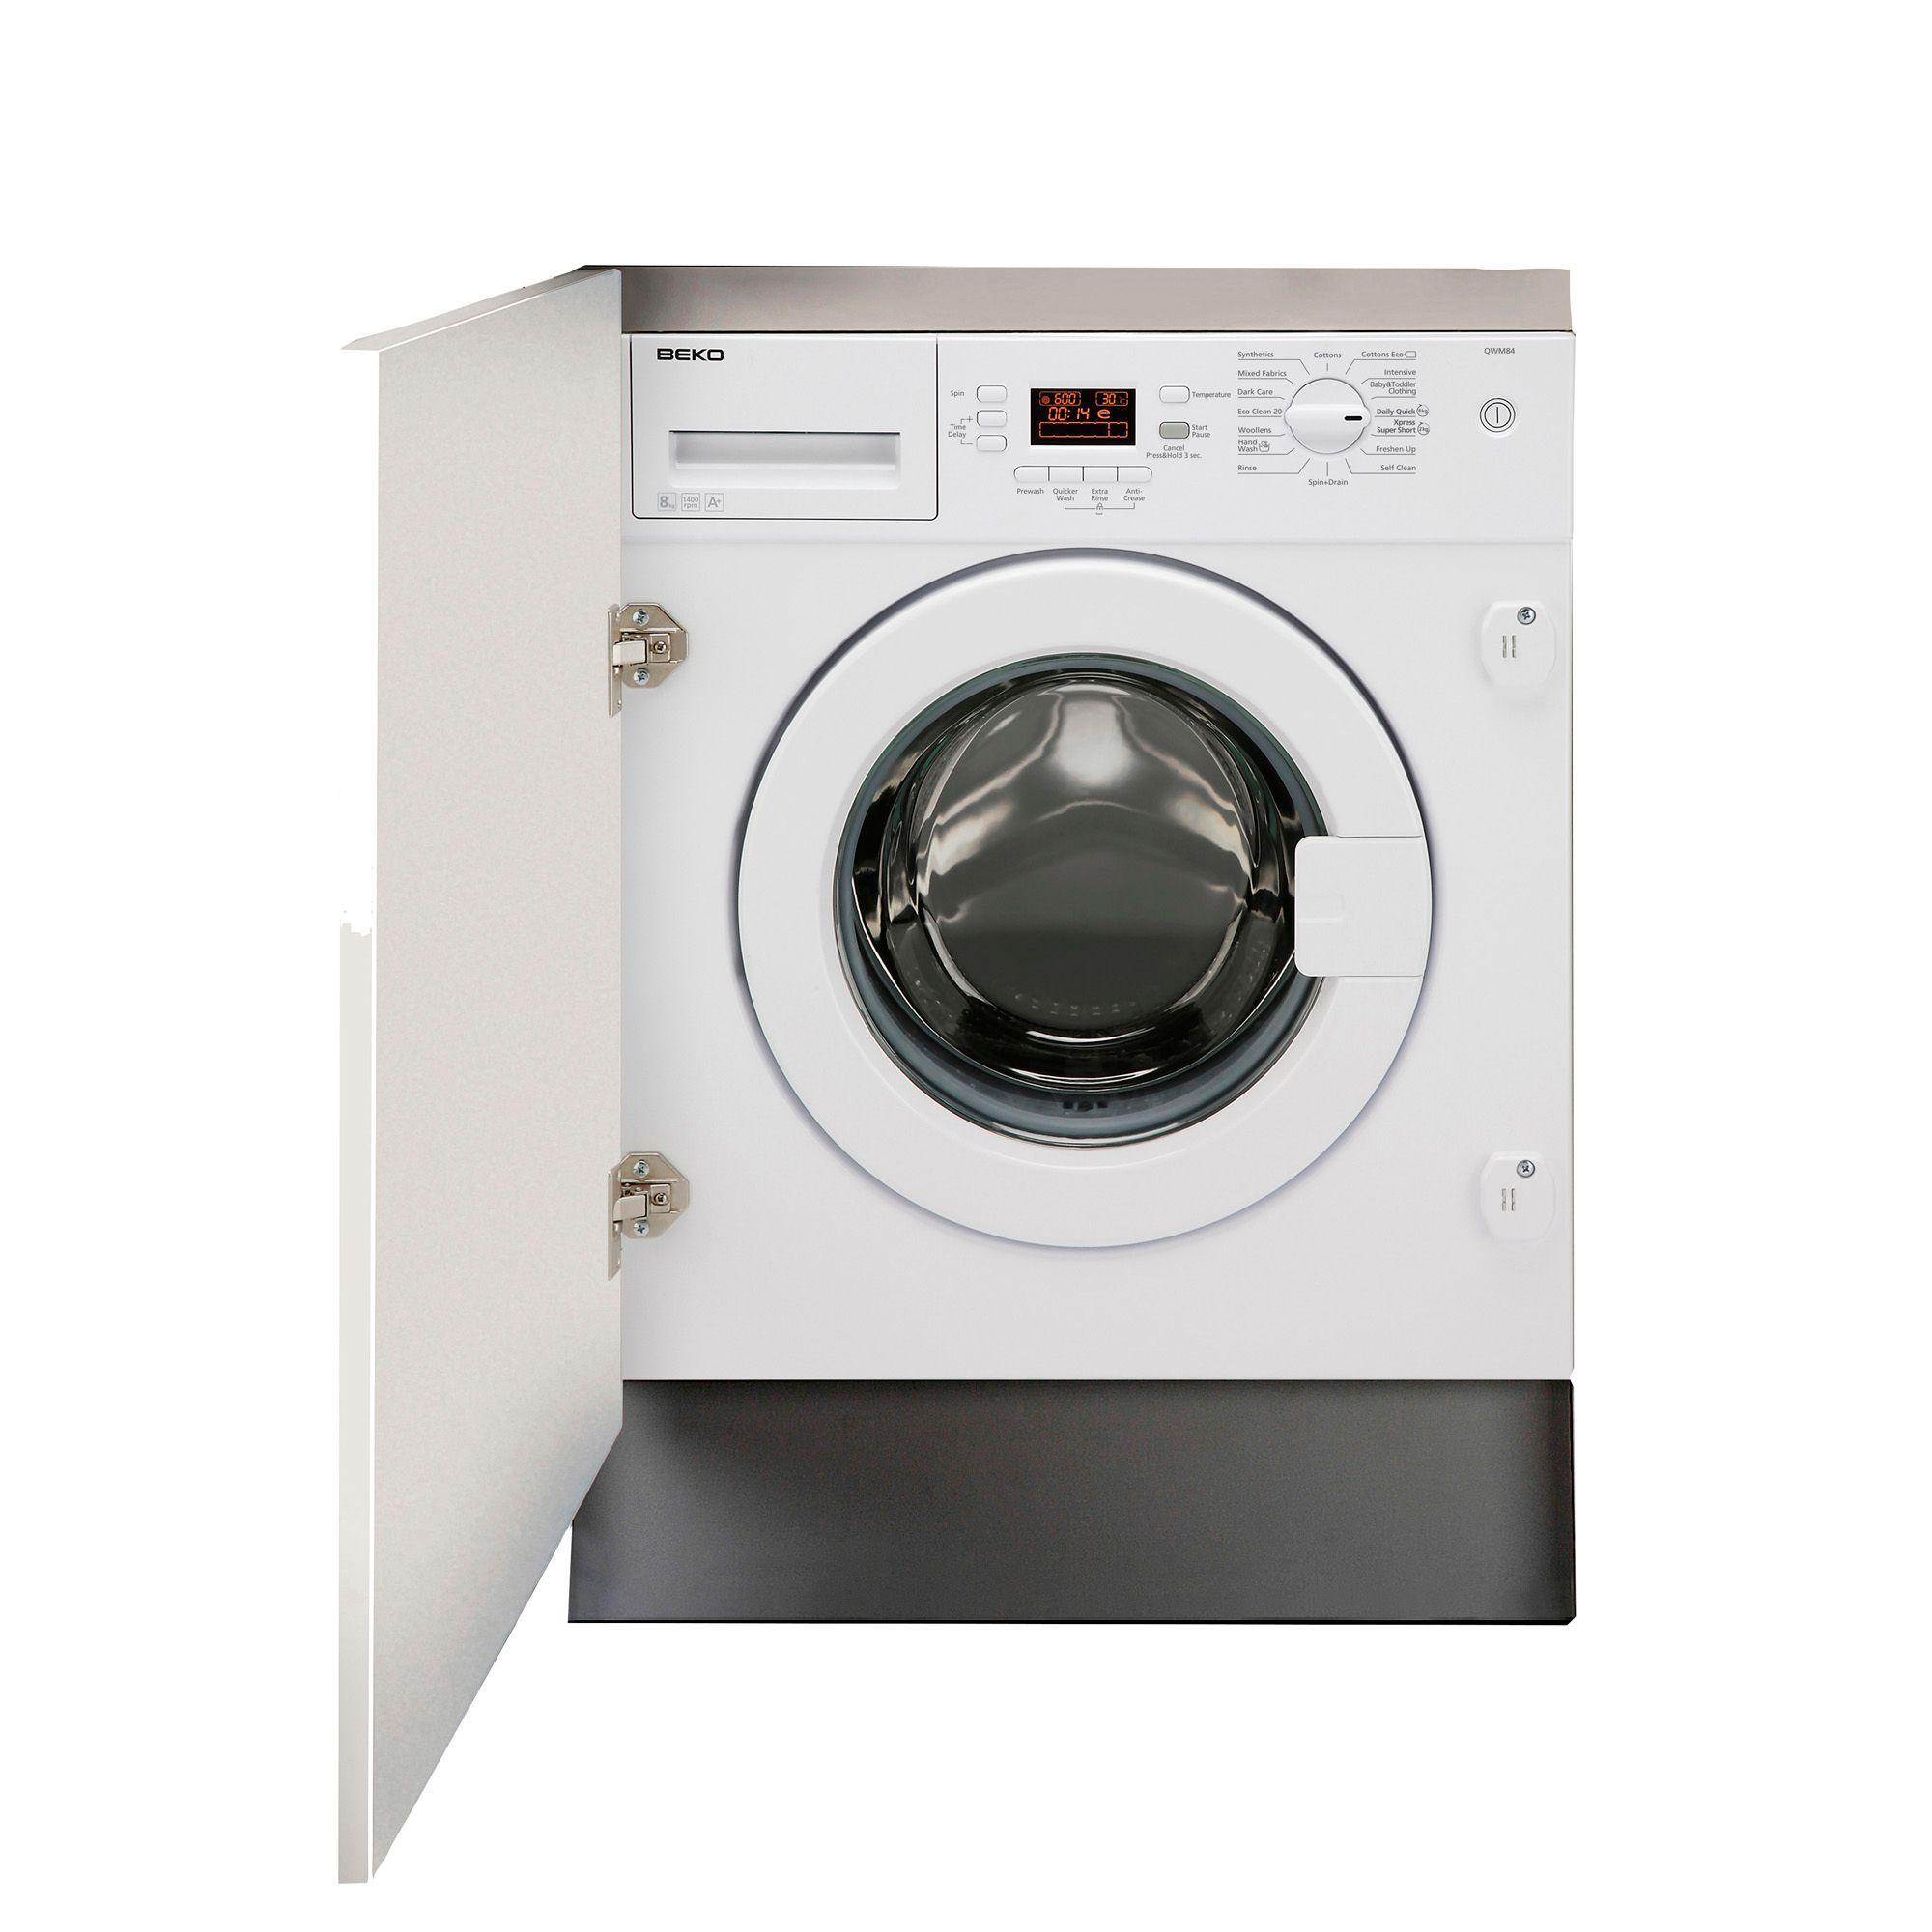 beko qwm84 white built in washing machine departments. Black Bedroom Furniture Sets. Home Design Ideas